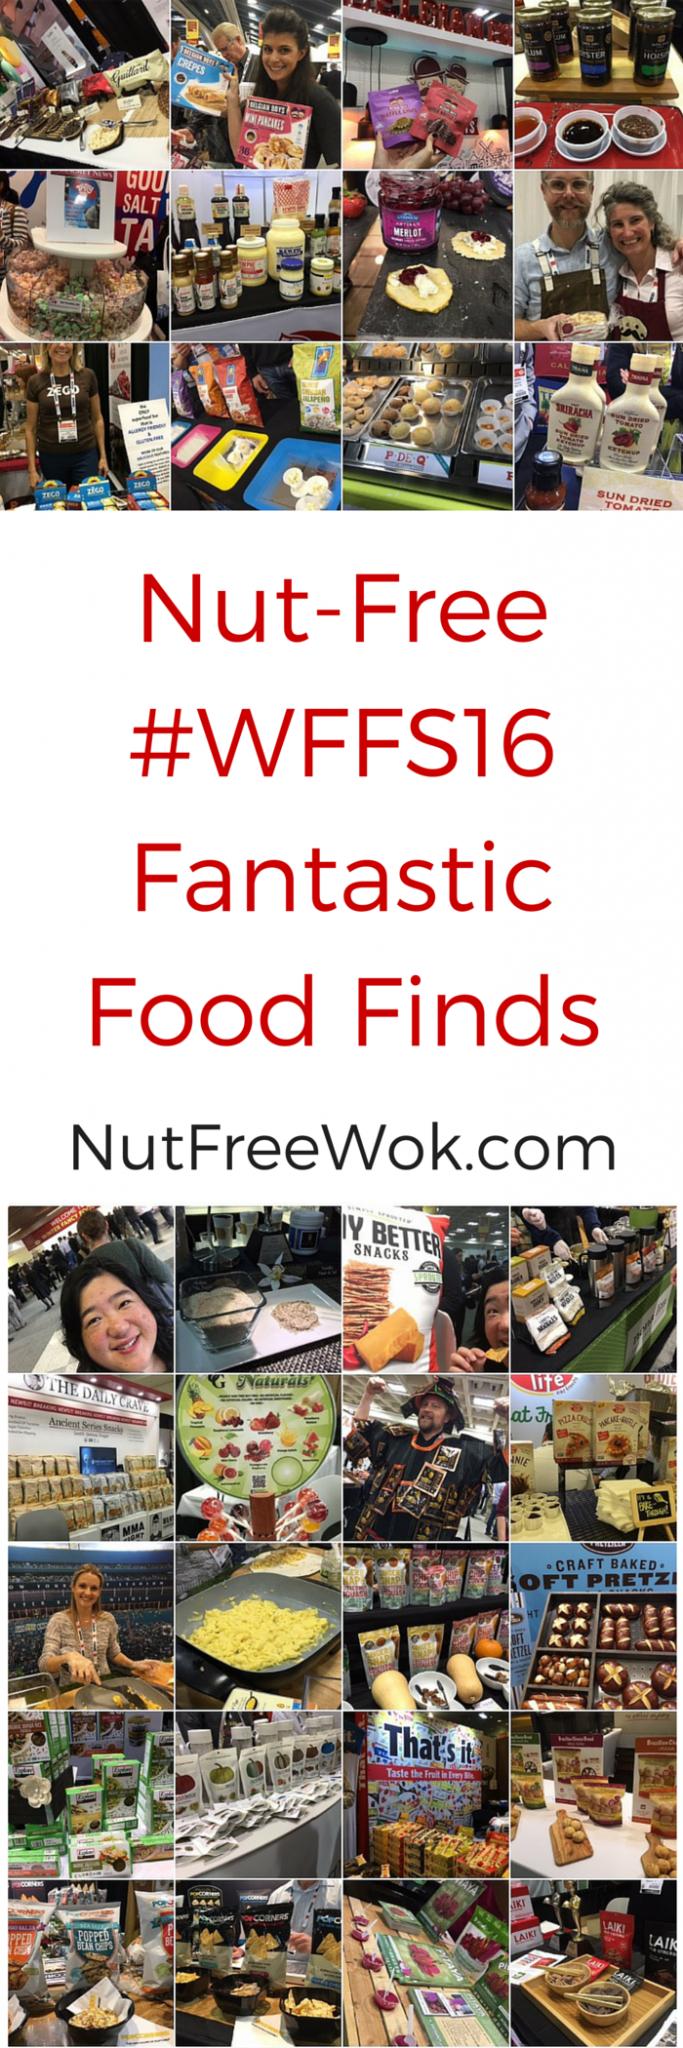 Nut-Free #WFFS16 Fantastic Food Finds nutfreewok.com